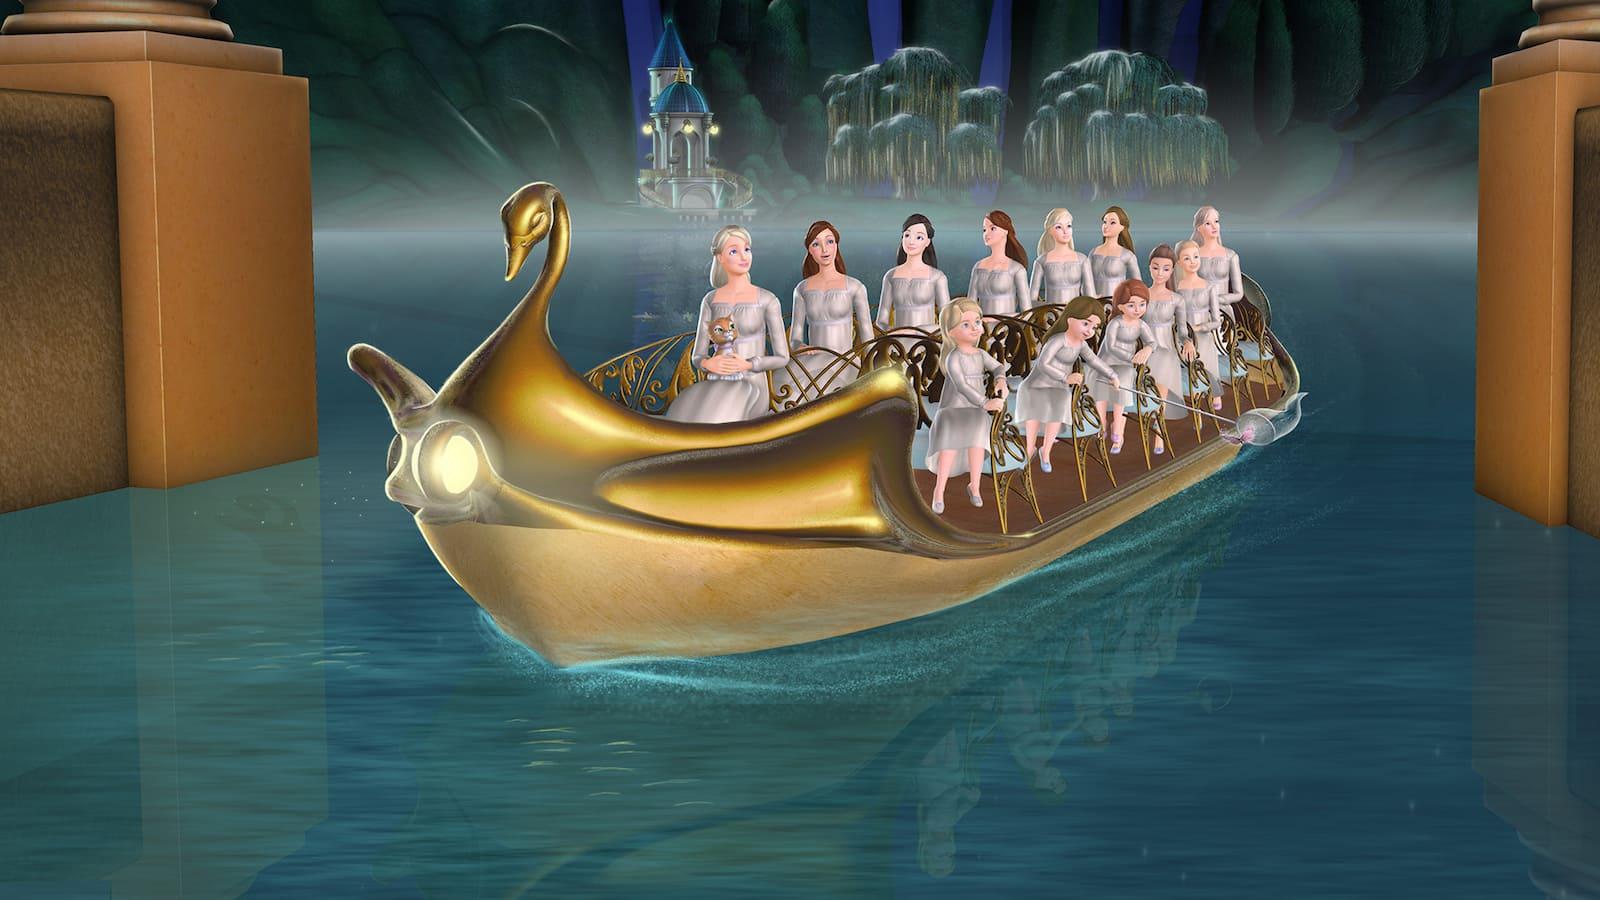 barbie-och-de-12-dansande-prinsessorna-2006